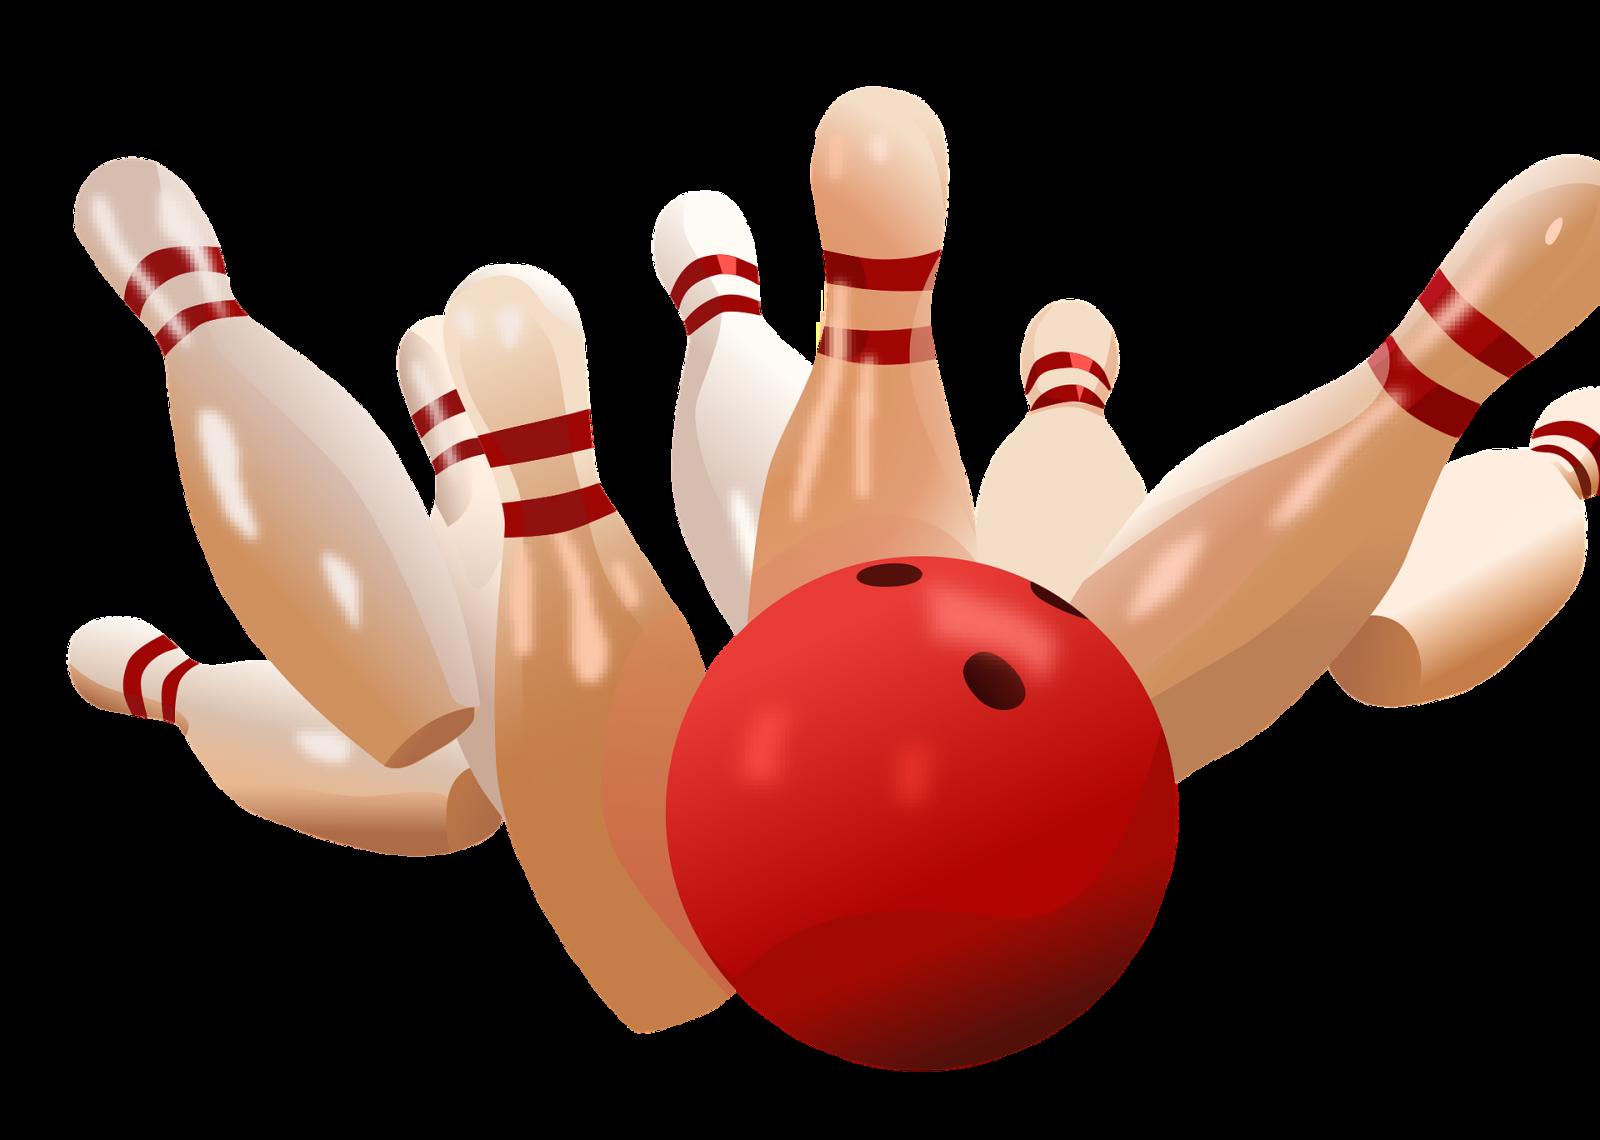 Coconut clipart bowling. My scorecard app alley